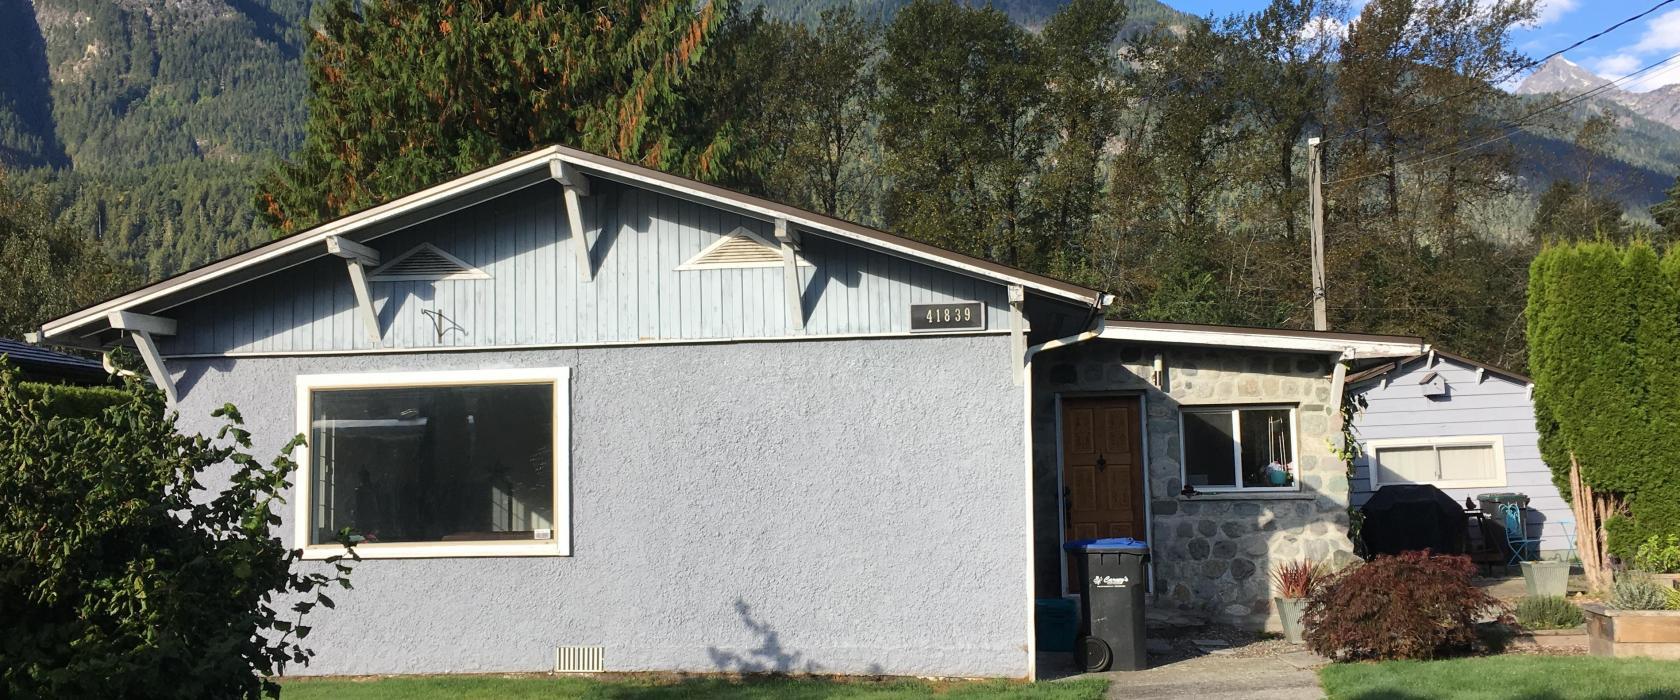 41839 Birken Road, Brackendale, Squamish